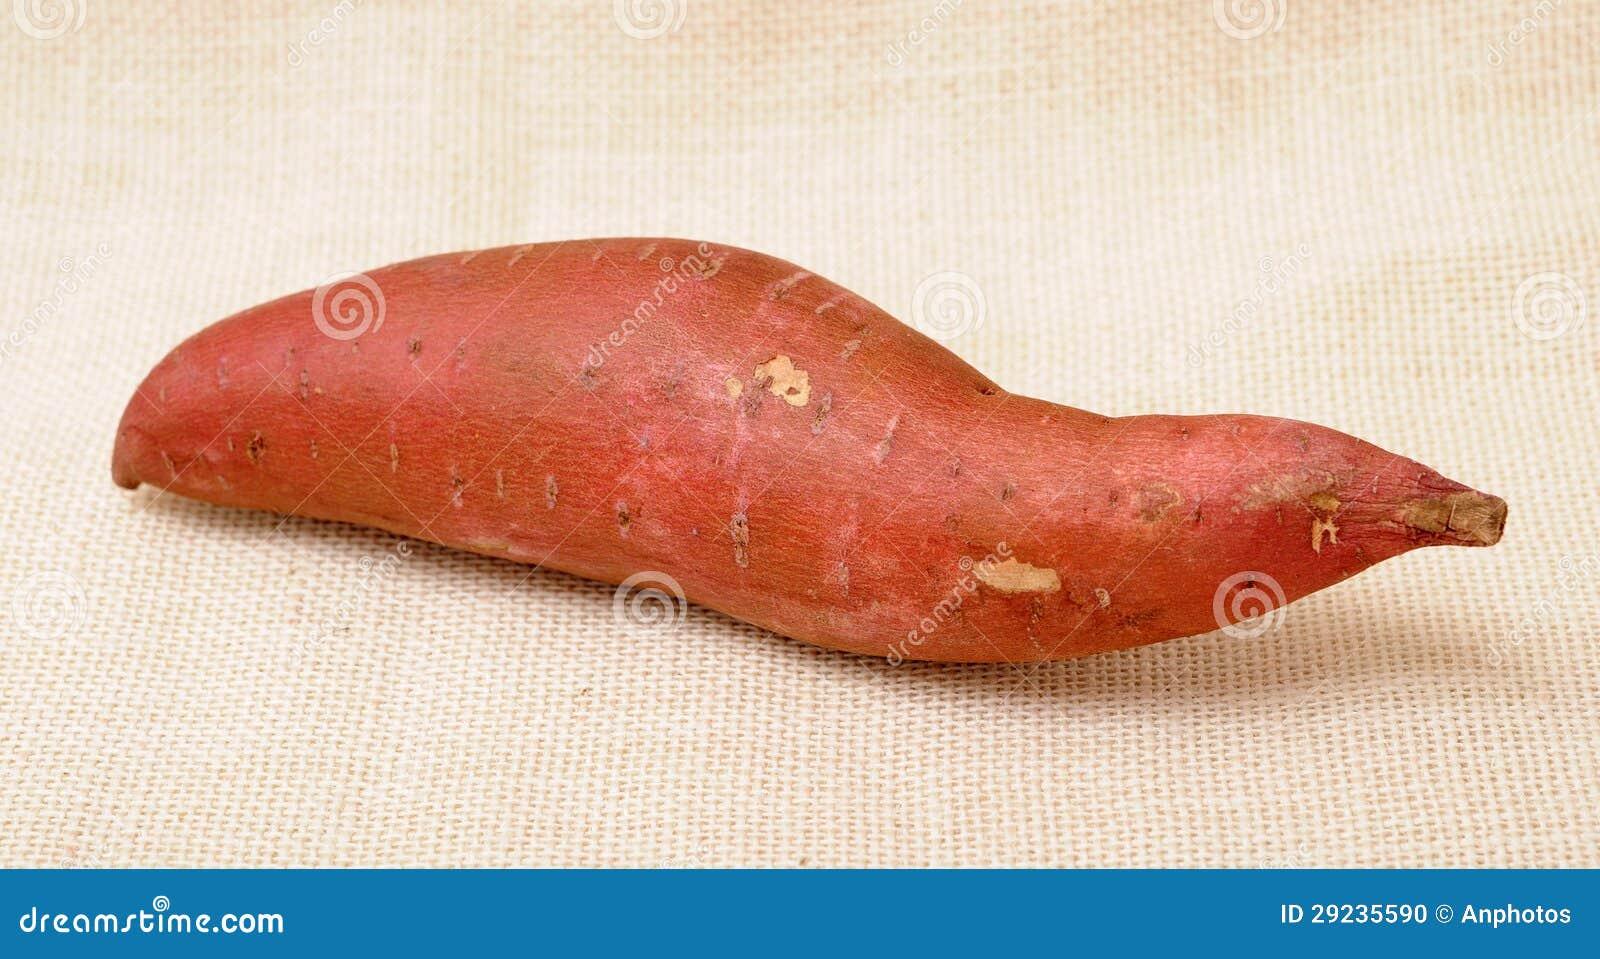 Download Batatas doces foto de stock. Imagem de tuber, harriet - 29235590